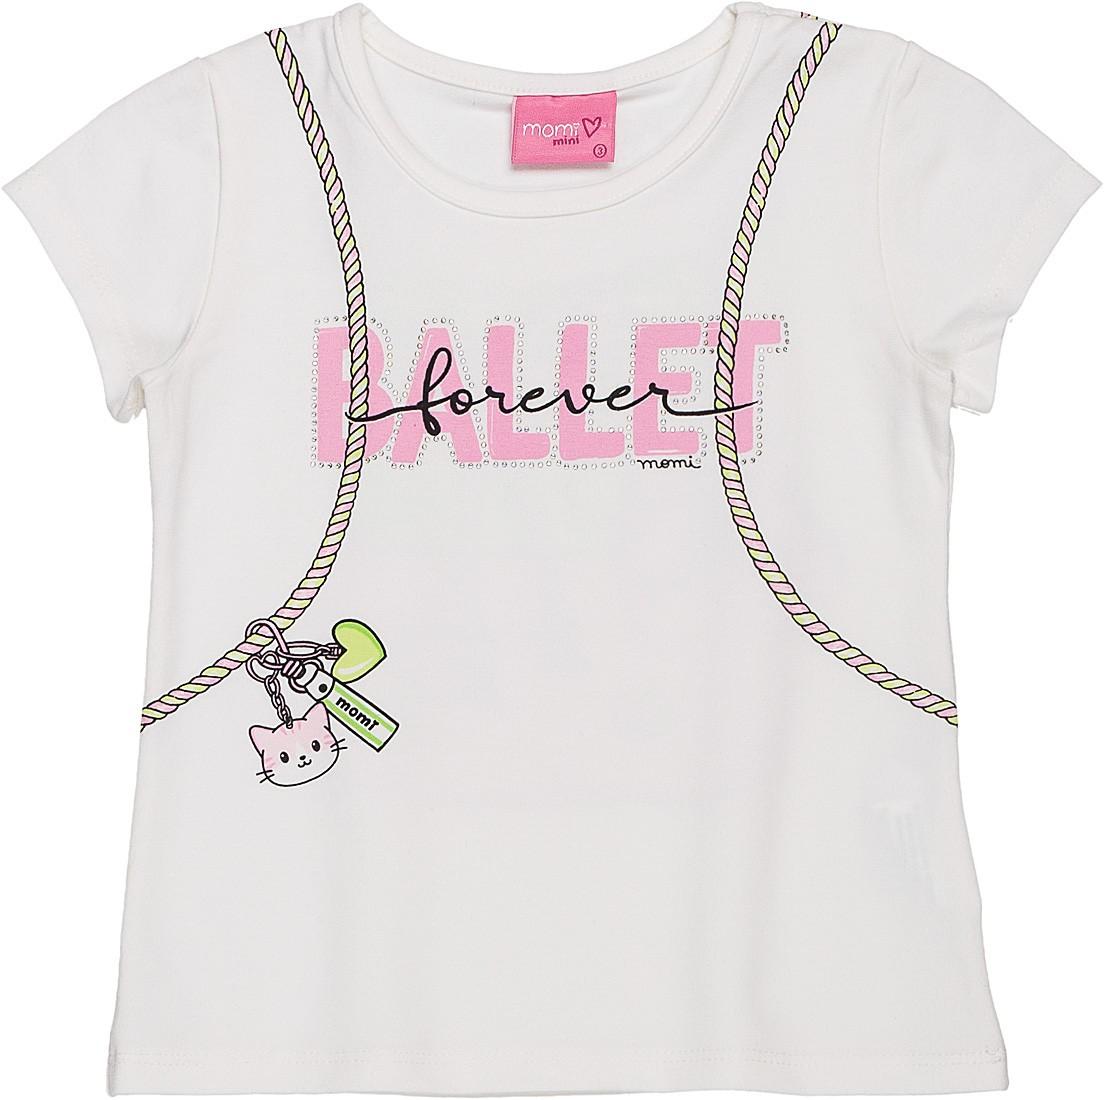 Blusa mochila Ballet Momi Mini